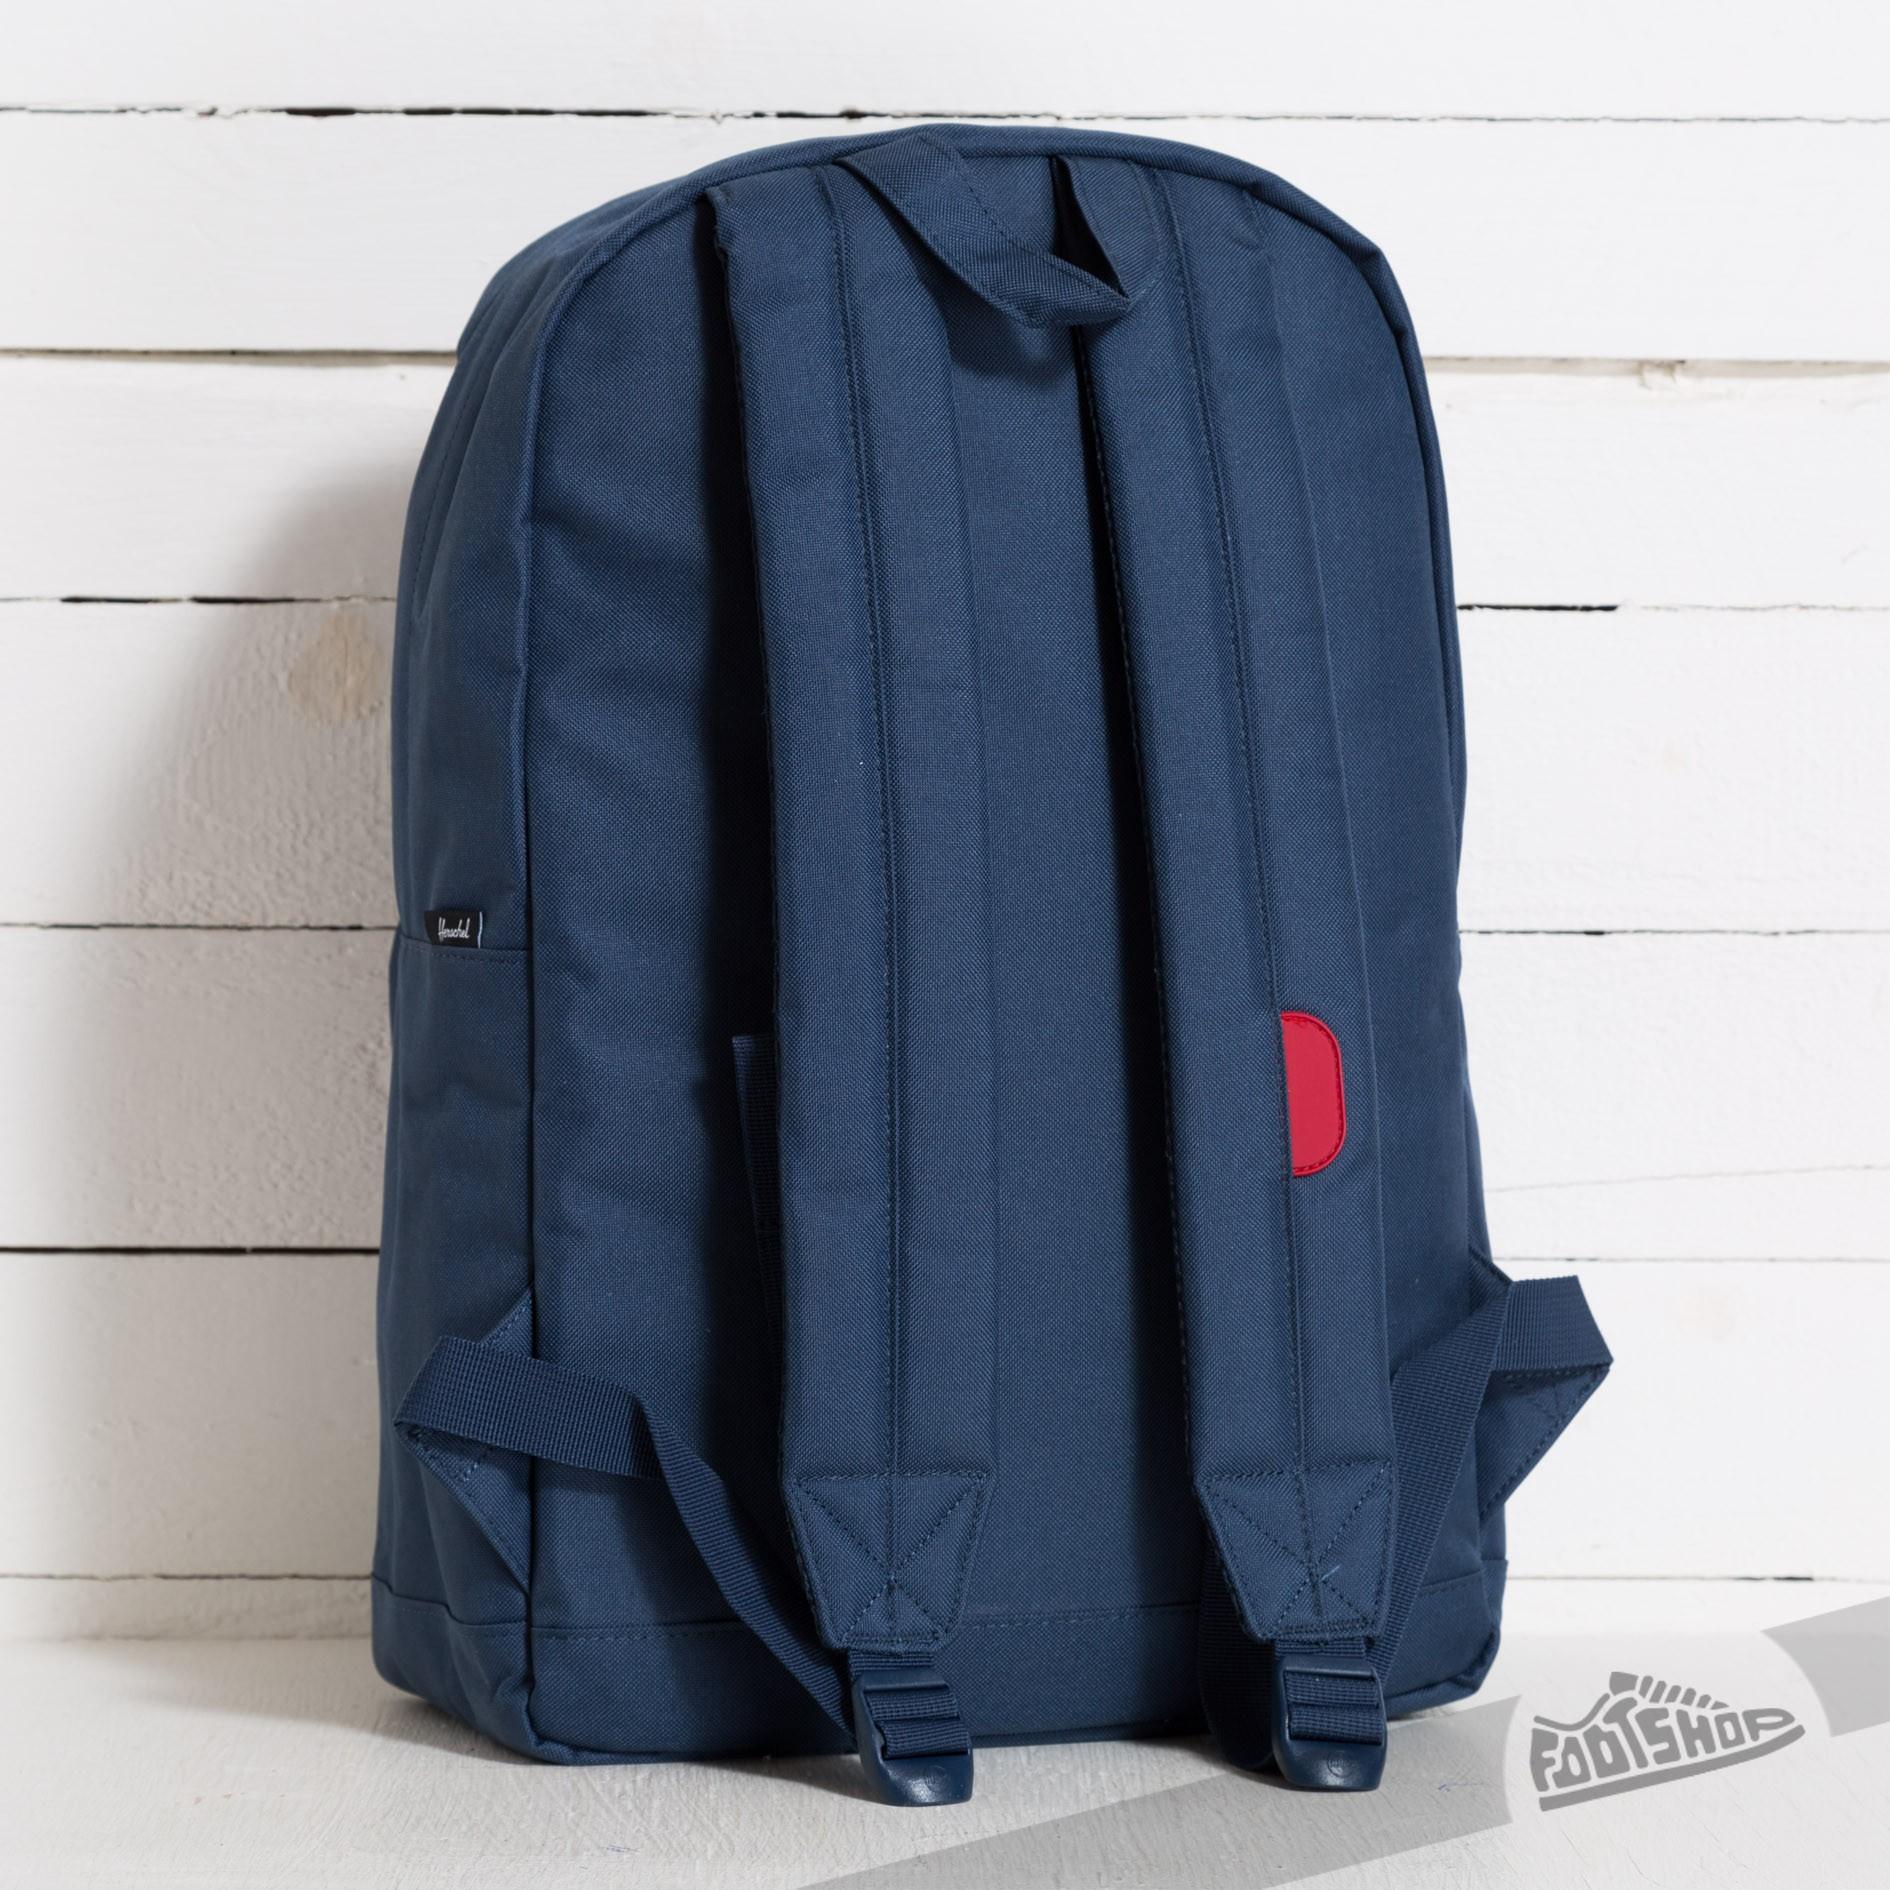 458d75a49a0 Herschel Supply Co. Pop Quiz Backpack Navy/Red | Footshop